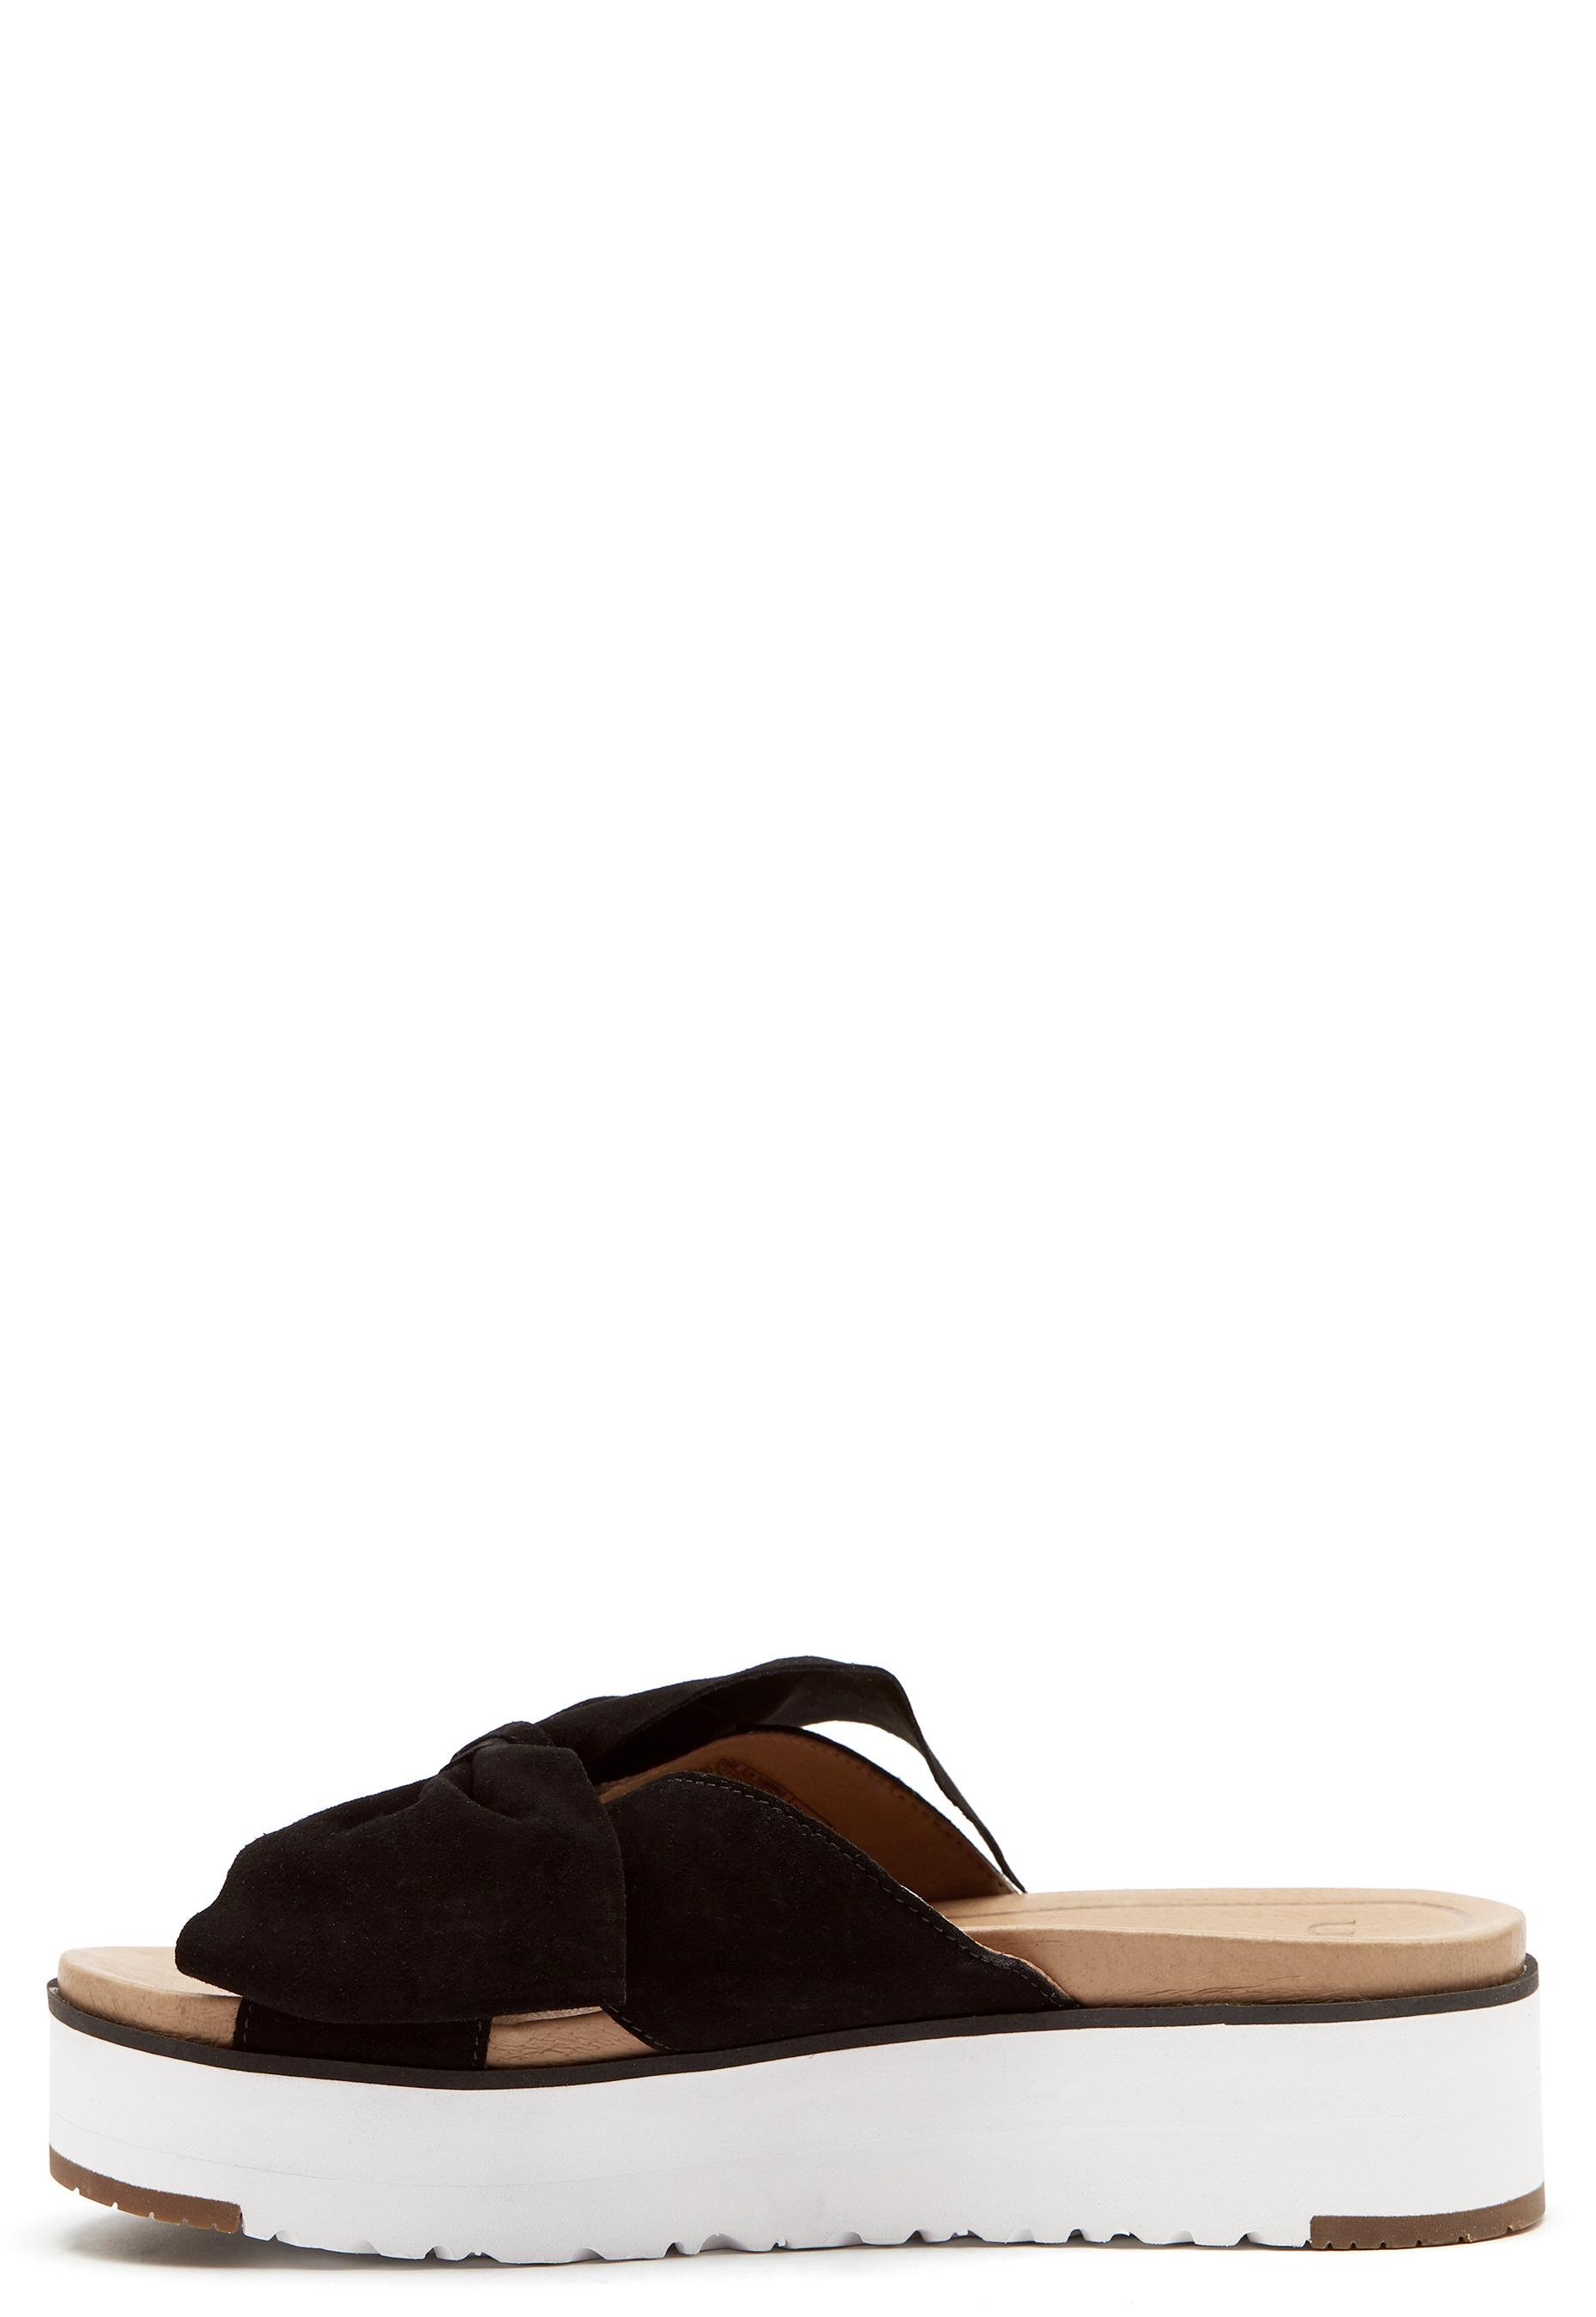 UGG Australia Joan II Sandals Black Bubbleroom